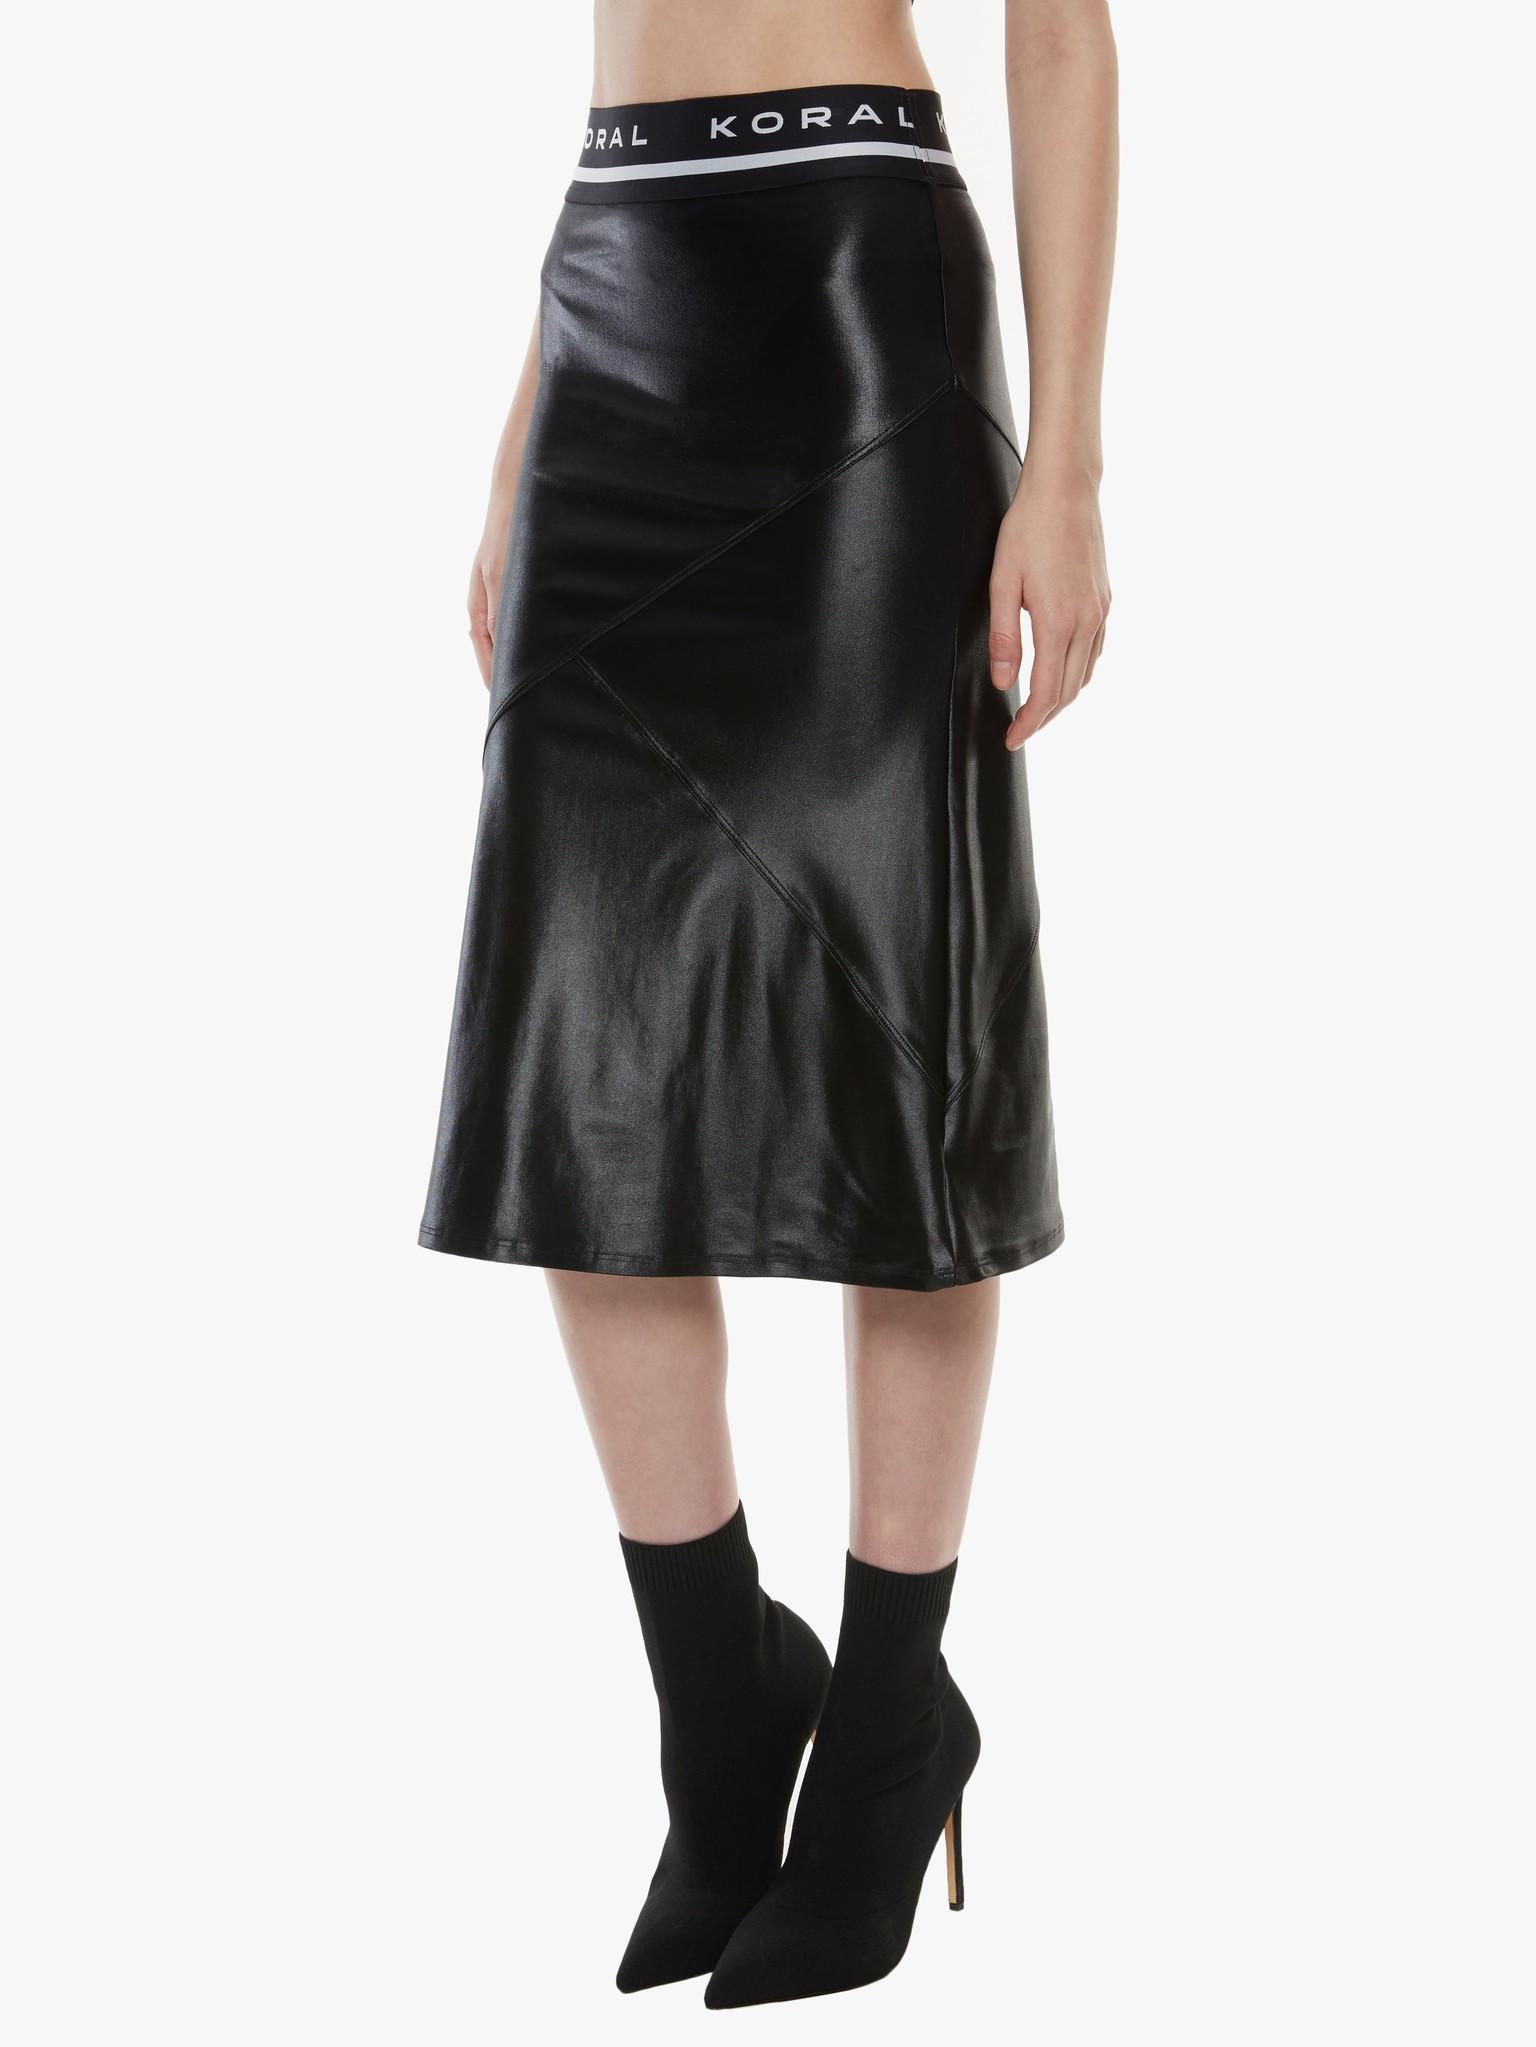 Koral Activewear Urban Infinity Skirt